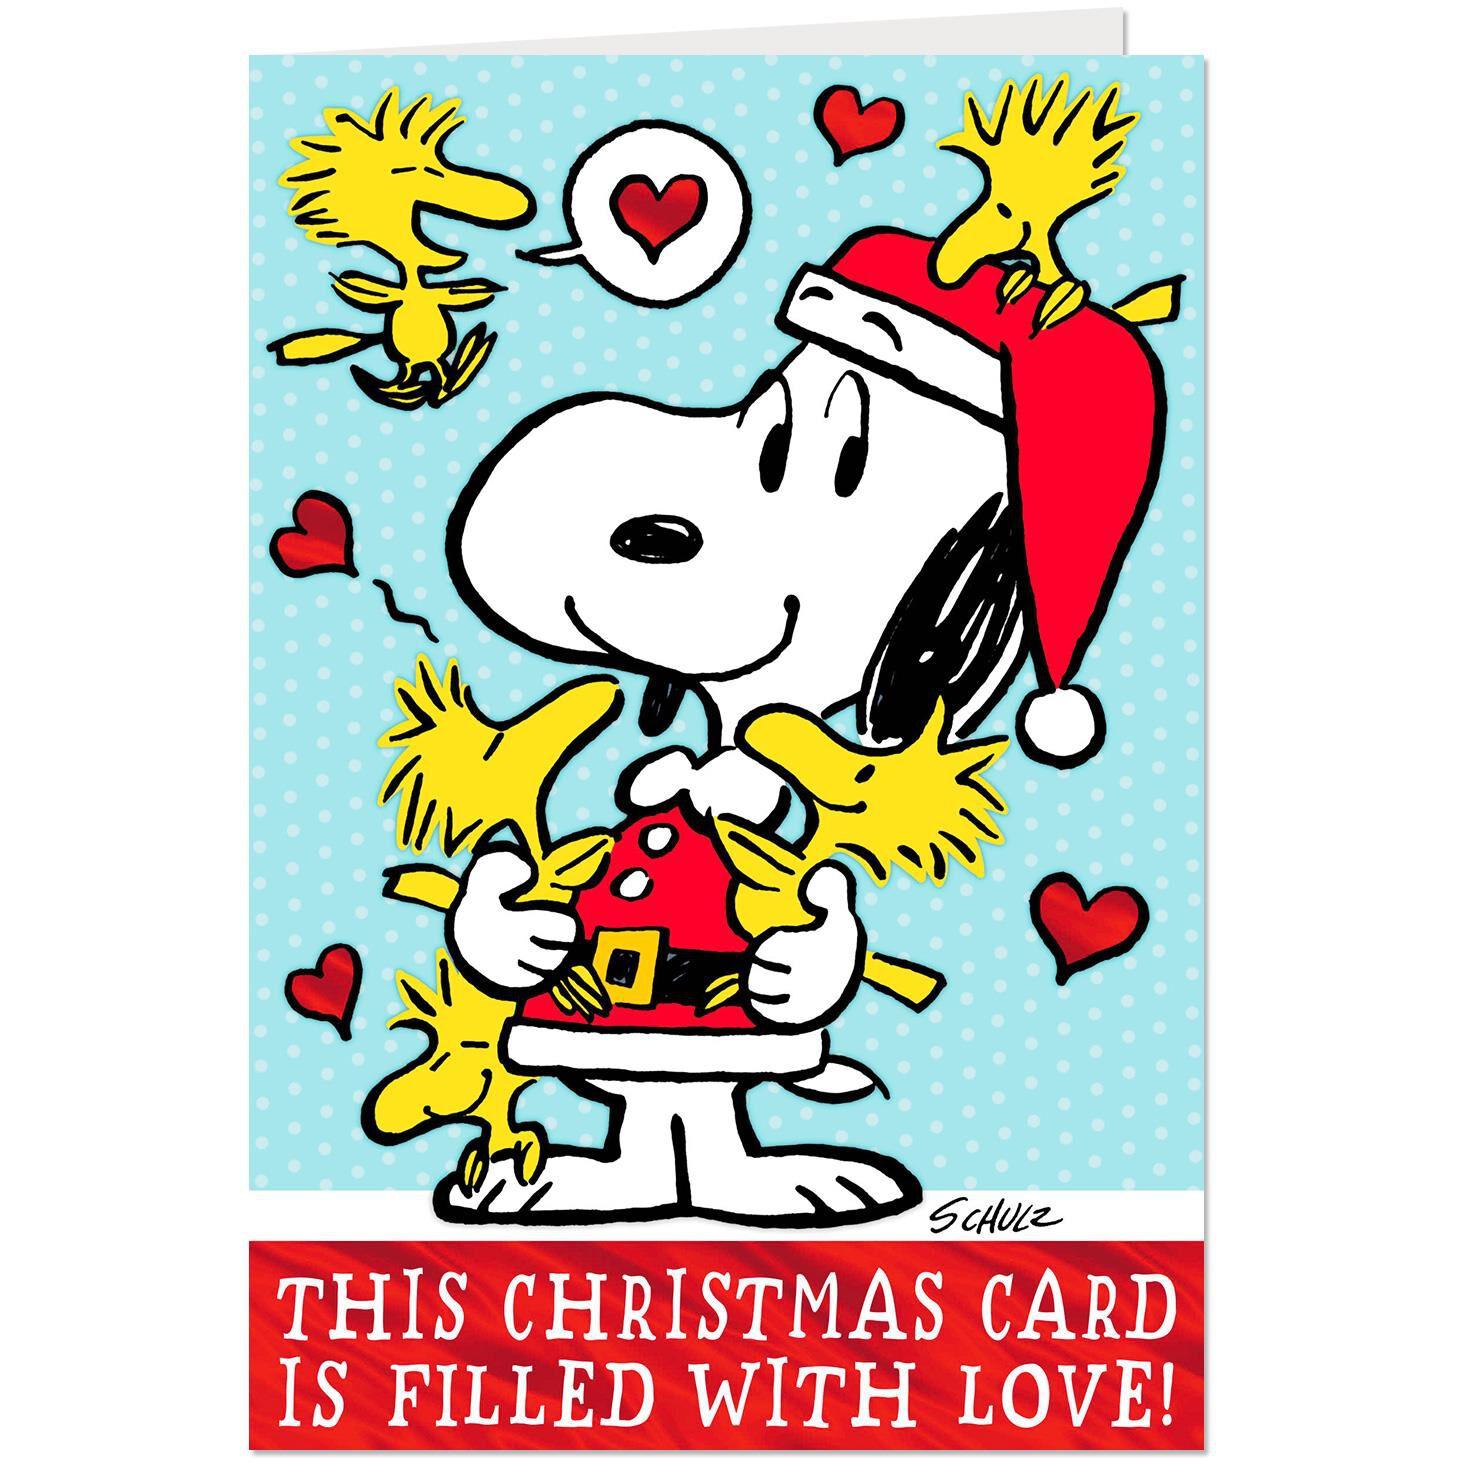 peanuts snoopy and woodstock christmas card with jokes greeting cards hallmark jpg 1470x1470 peanuts woodstock christmas